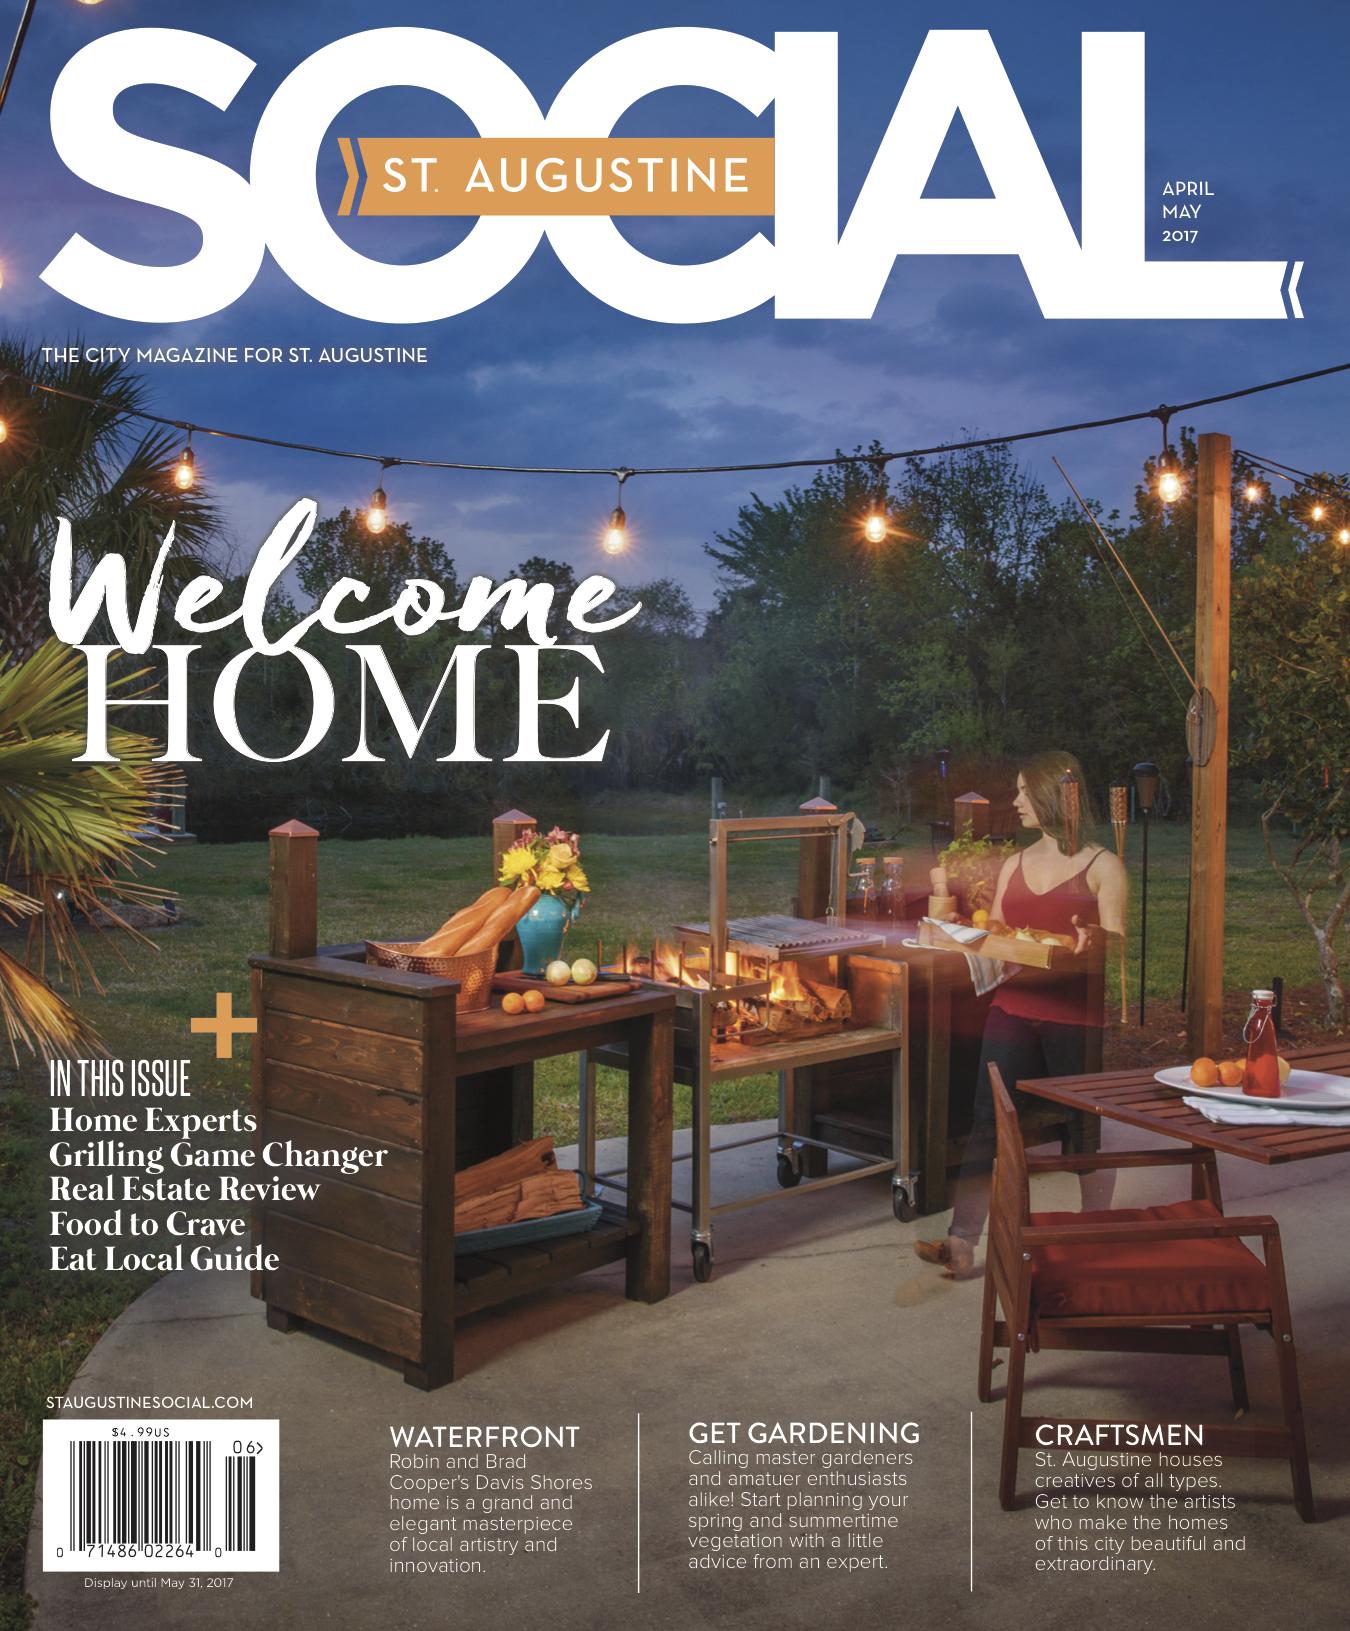 Cover - St. Augustine Social Apr: May 2017.jpg